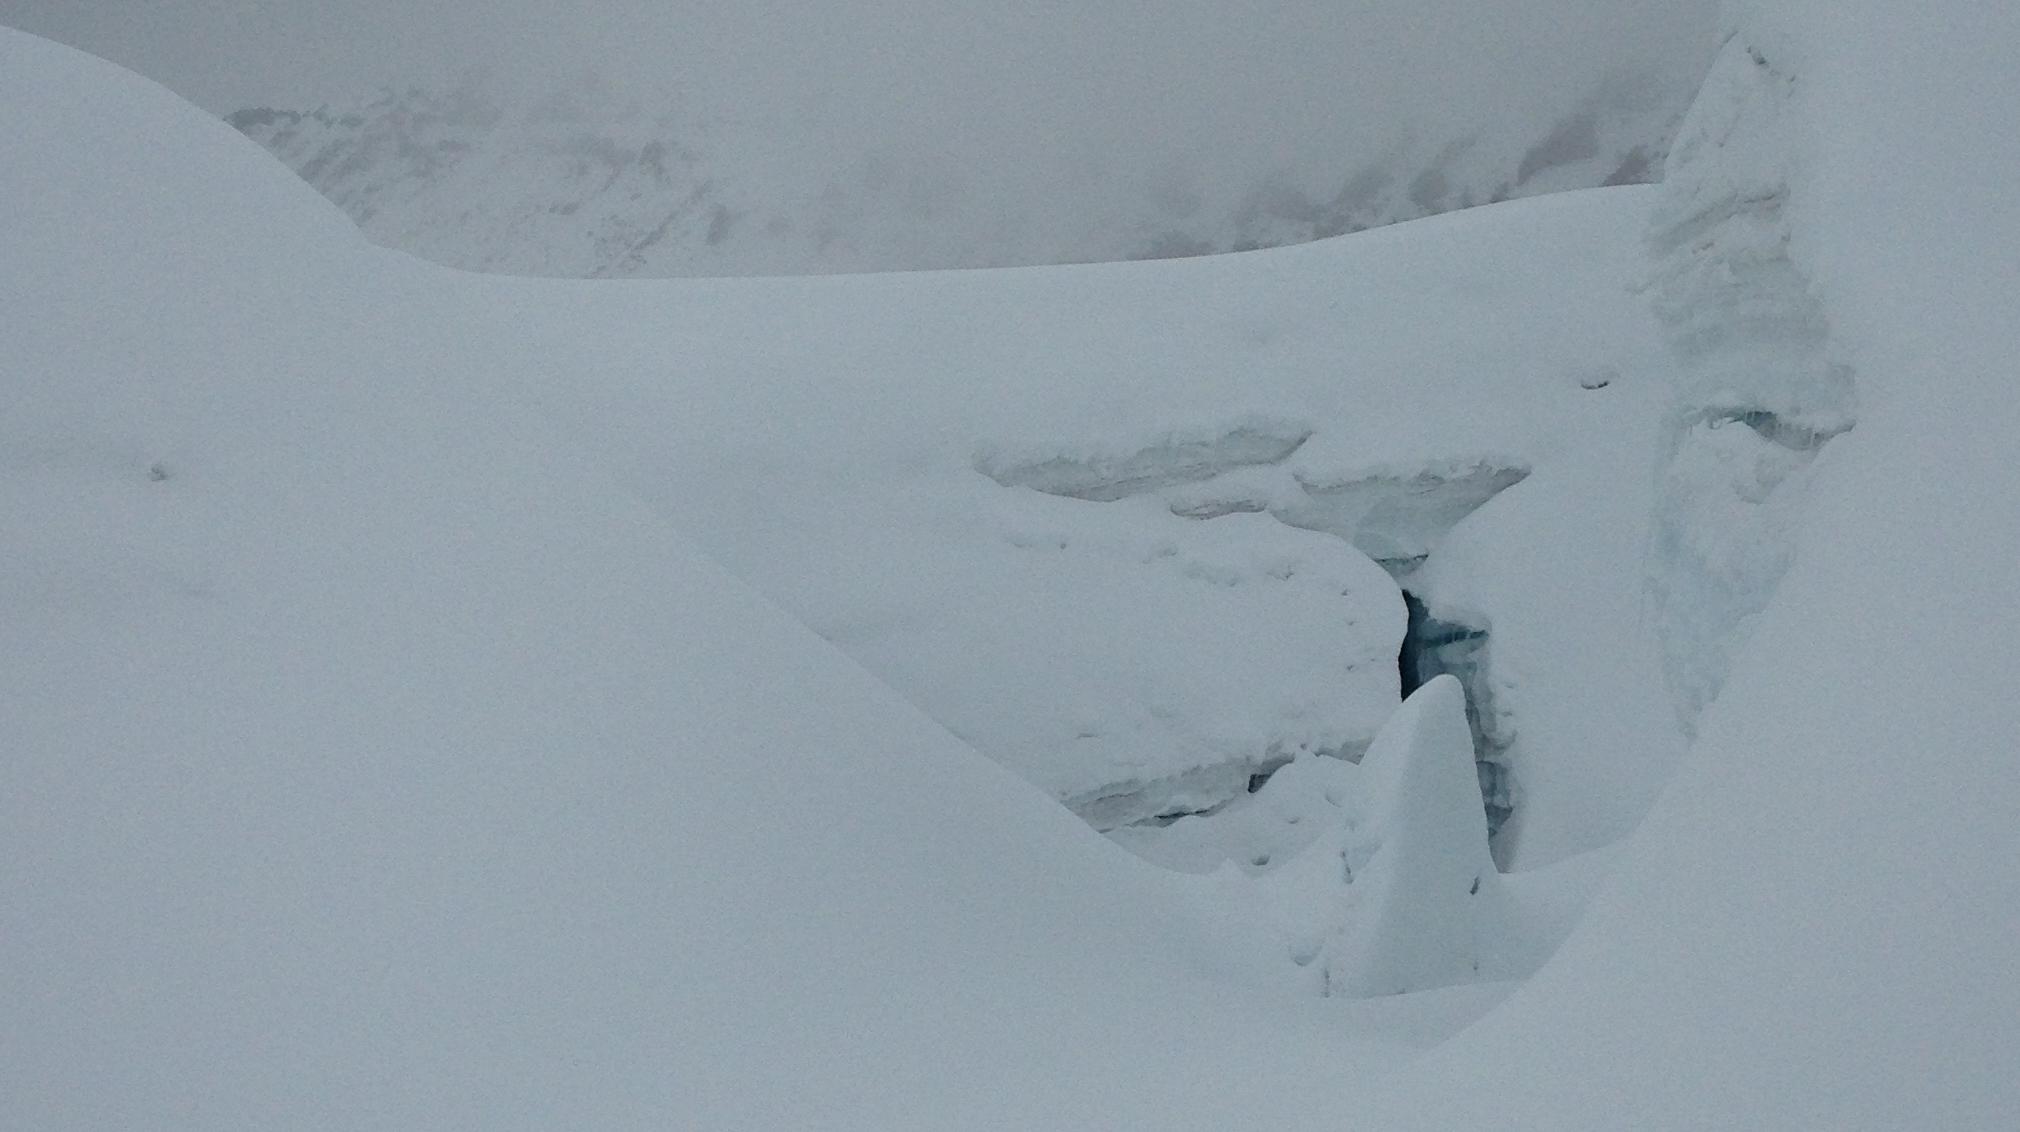 Complicated crevasse structure below Camp 2.